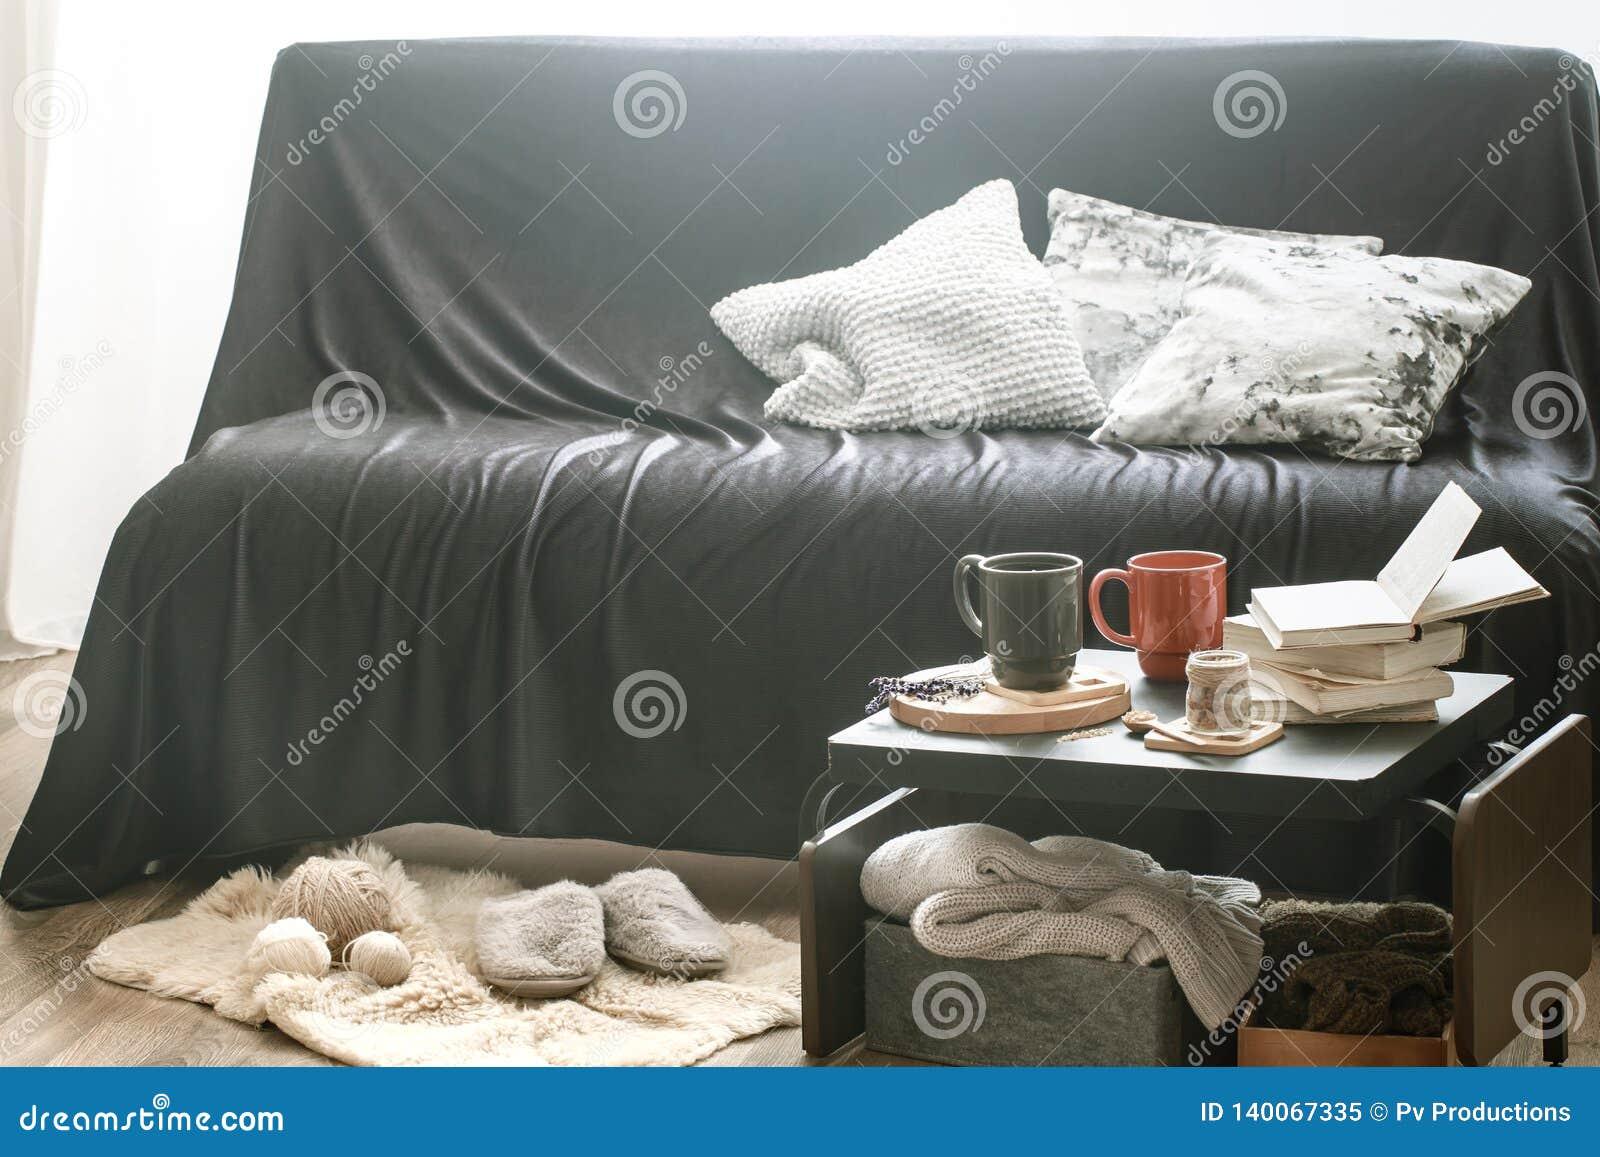 Cozy Home Interior Living Room With Black Sofa Stock Image Image Of Cushion Interior 140067335